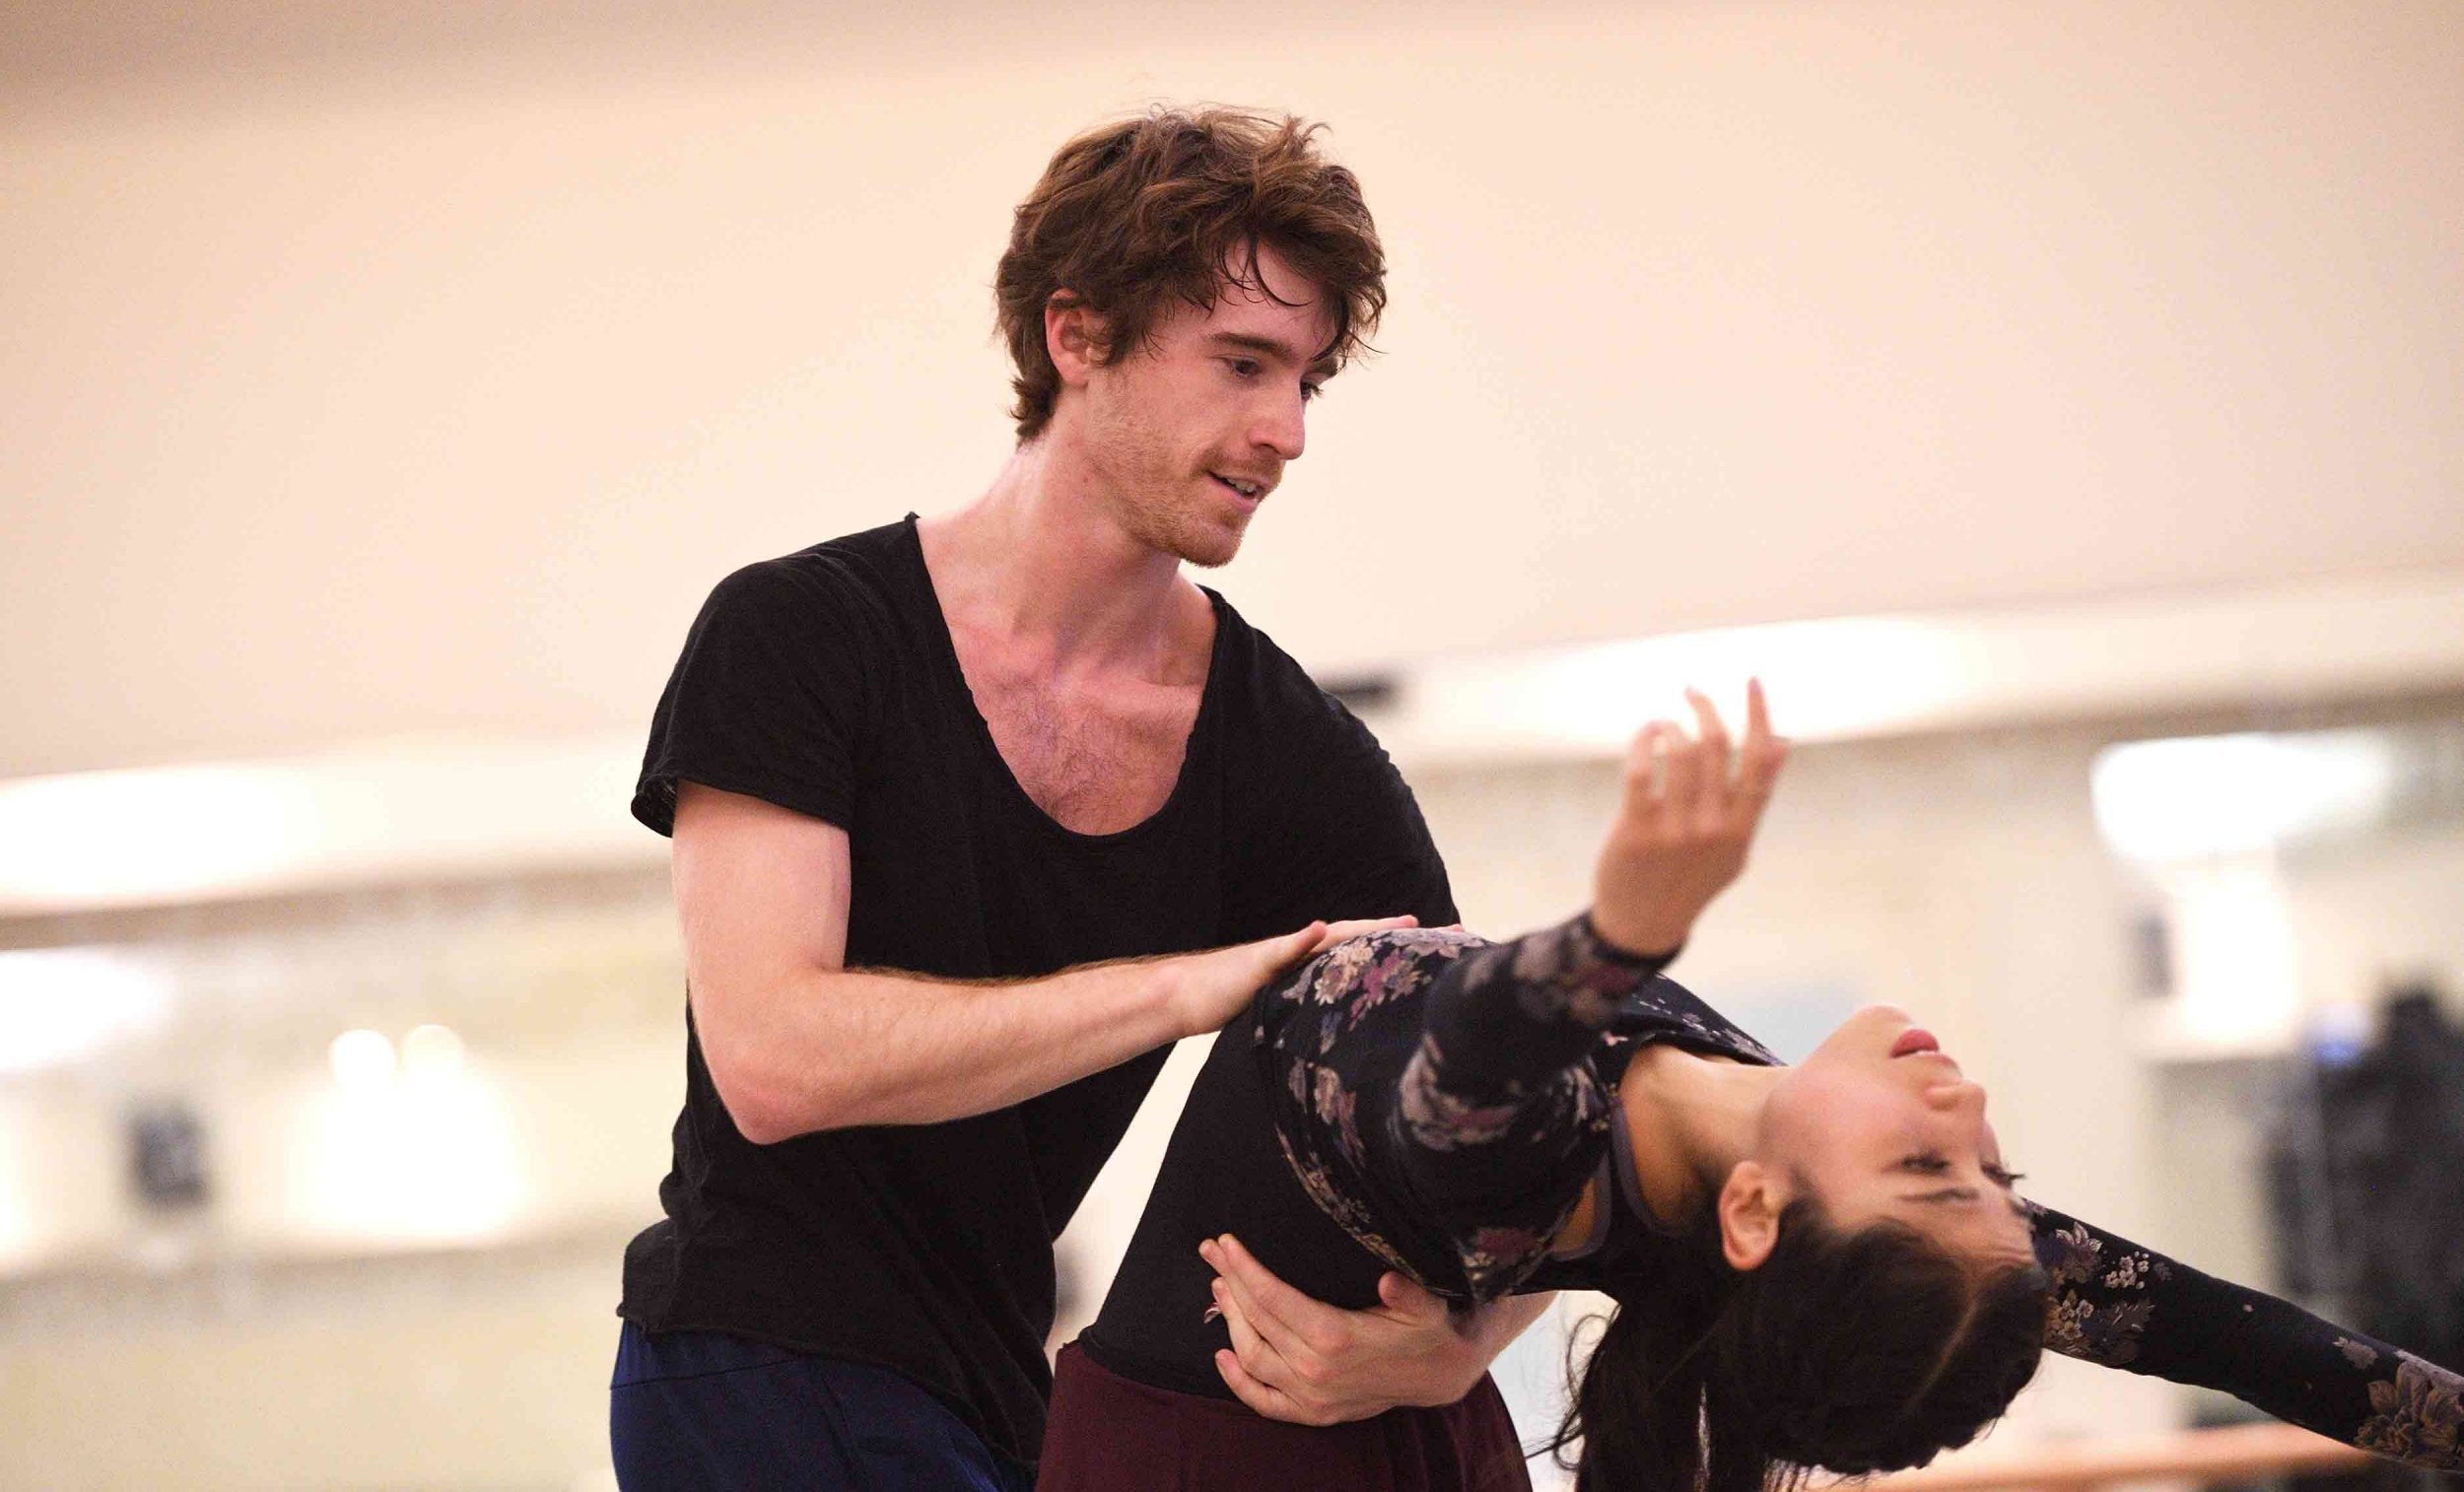 Crystal-Costa-and-Aitor-Arrieta-rehearsing-Akram-Khan's-Giselle-©-Laurent-Liotardo-(3)